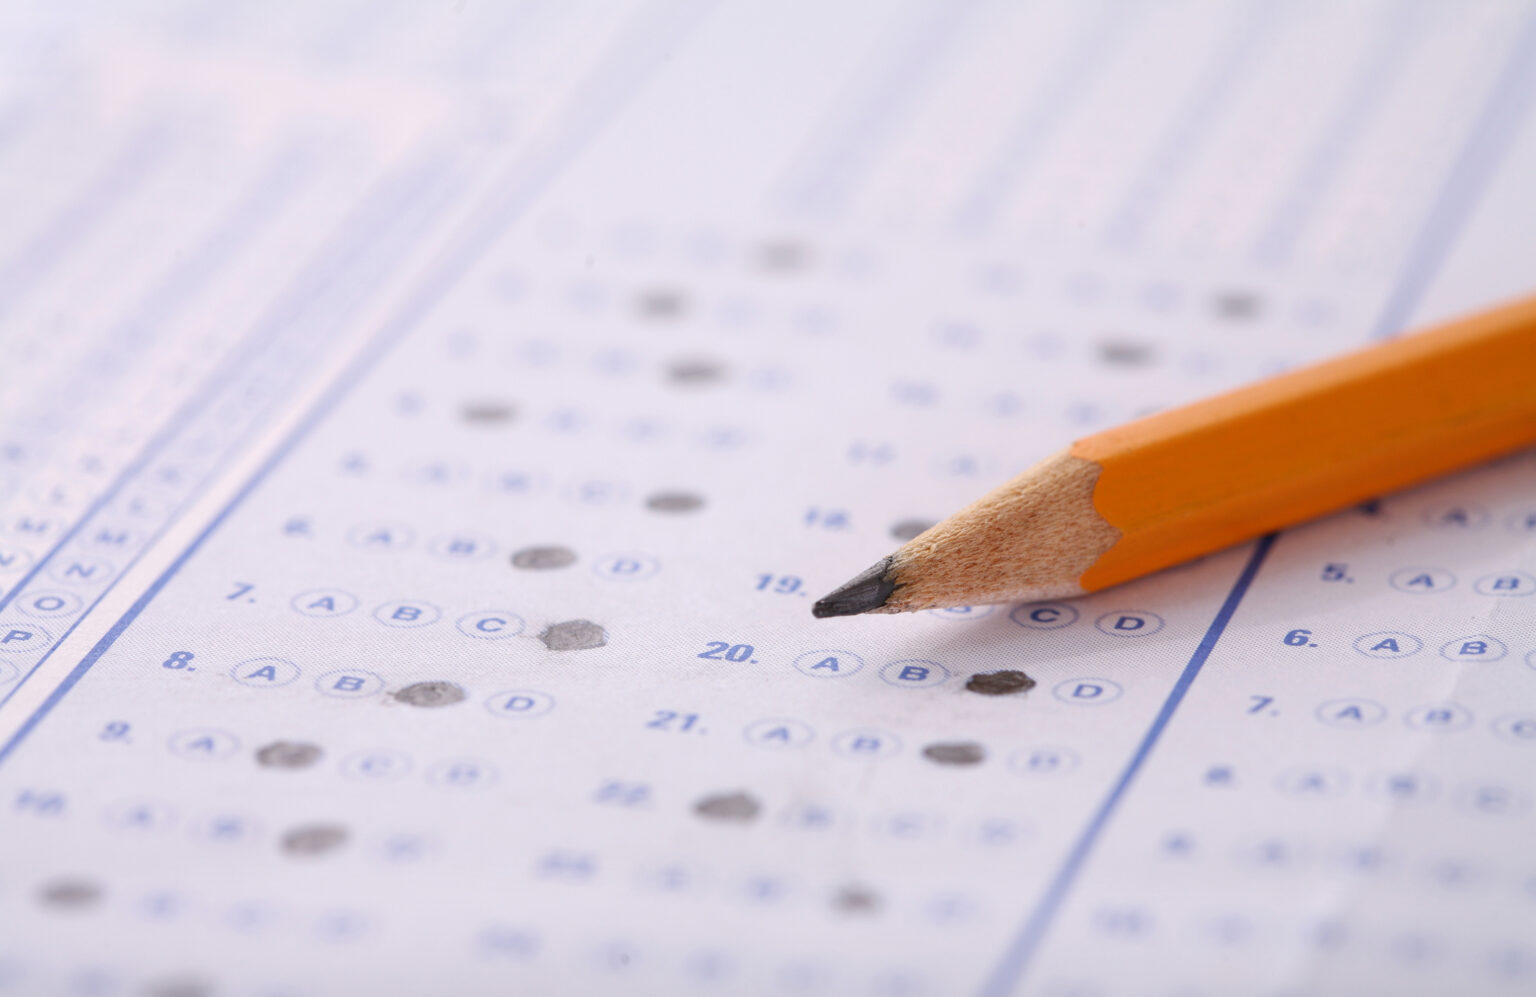 Amid the pandemic, Missouri standardized test scores declined across grades, subjects